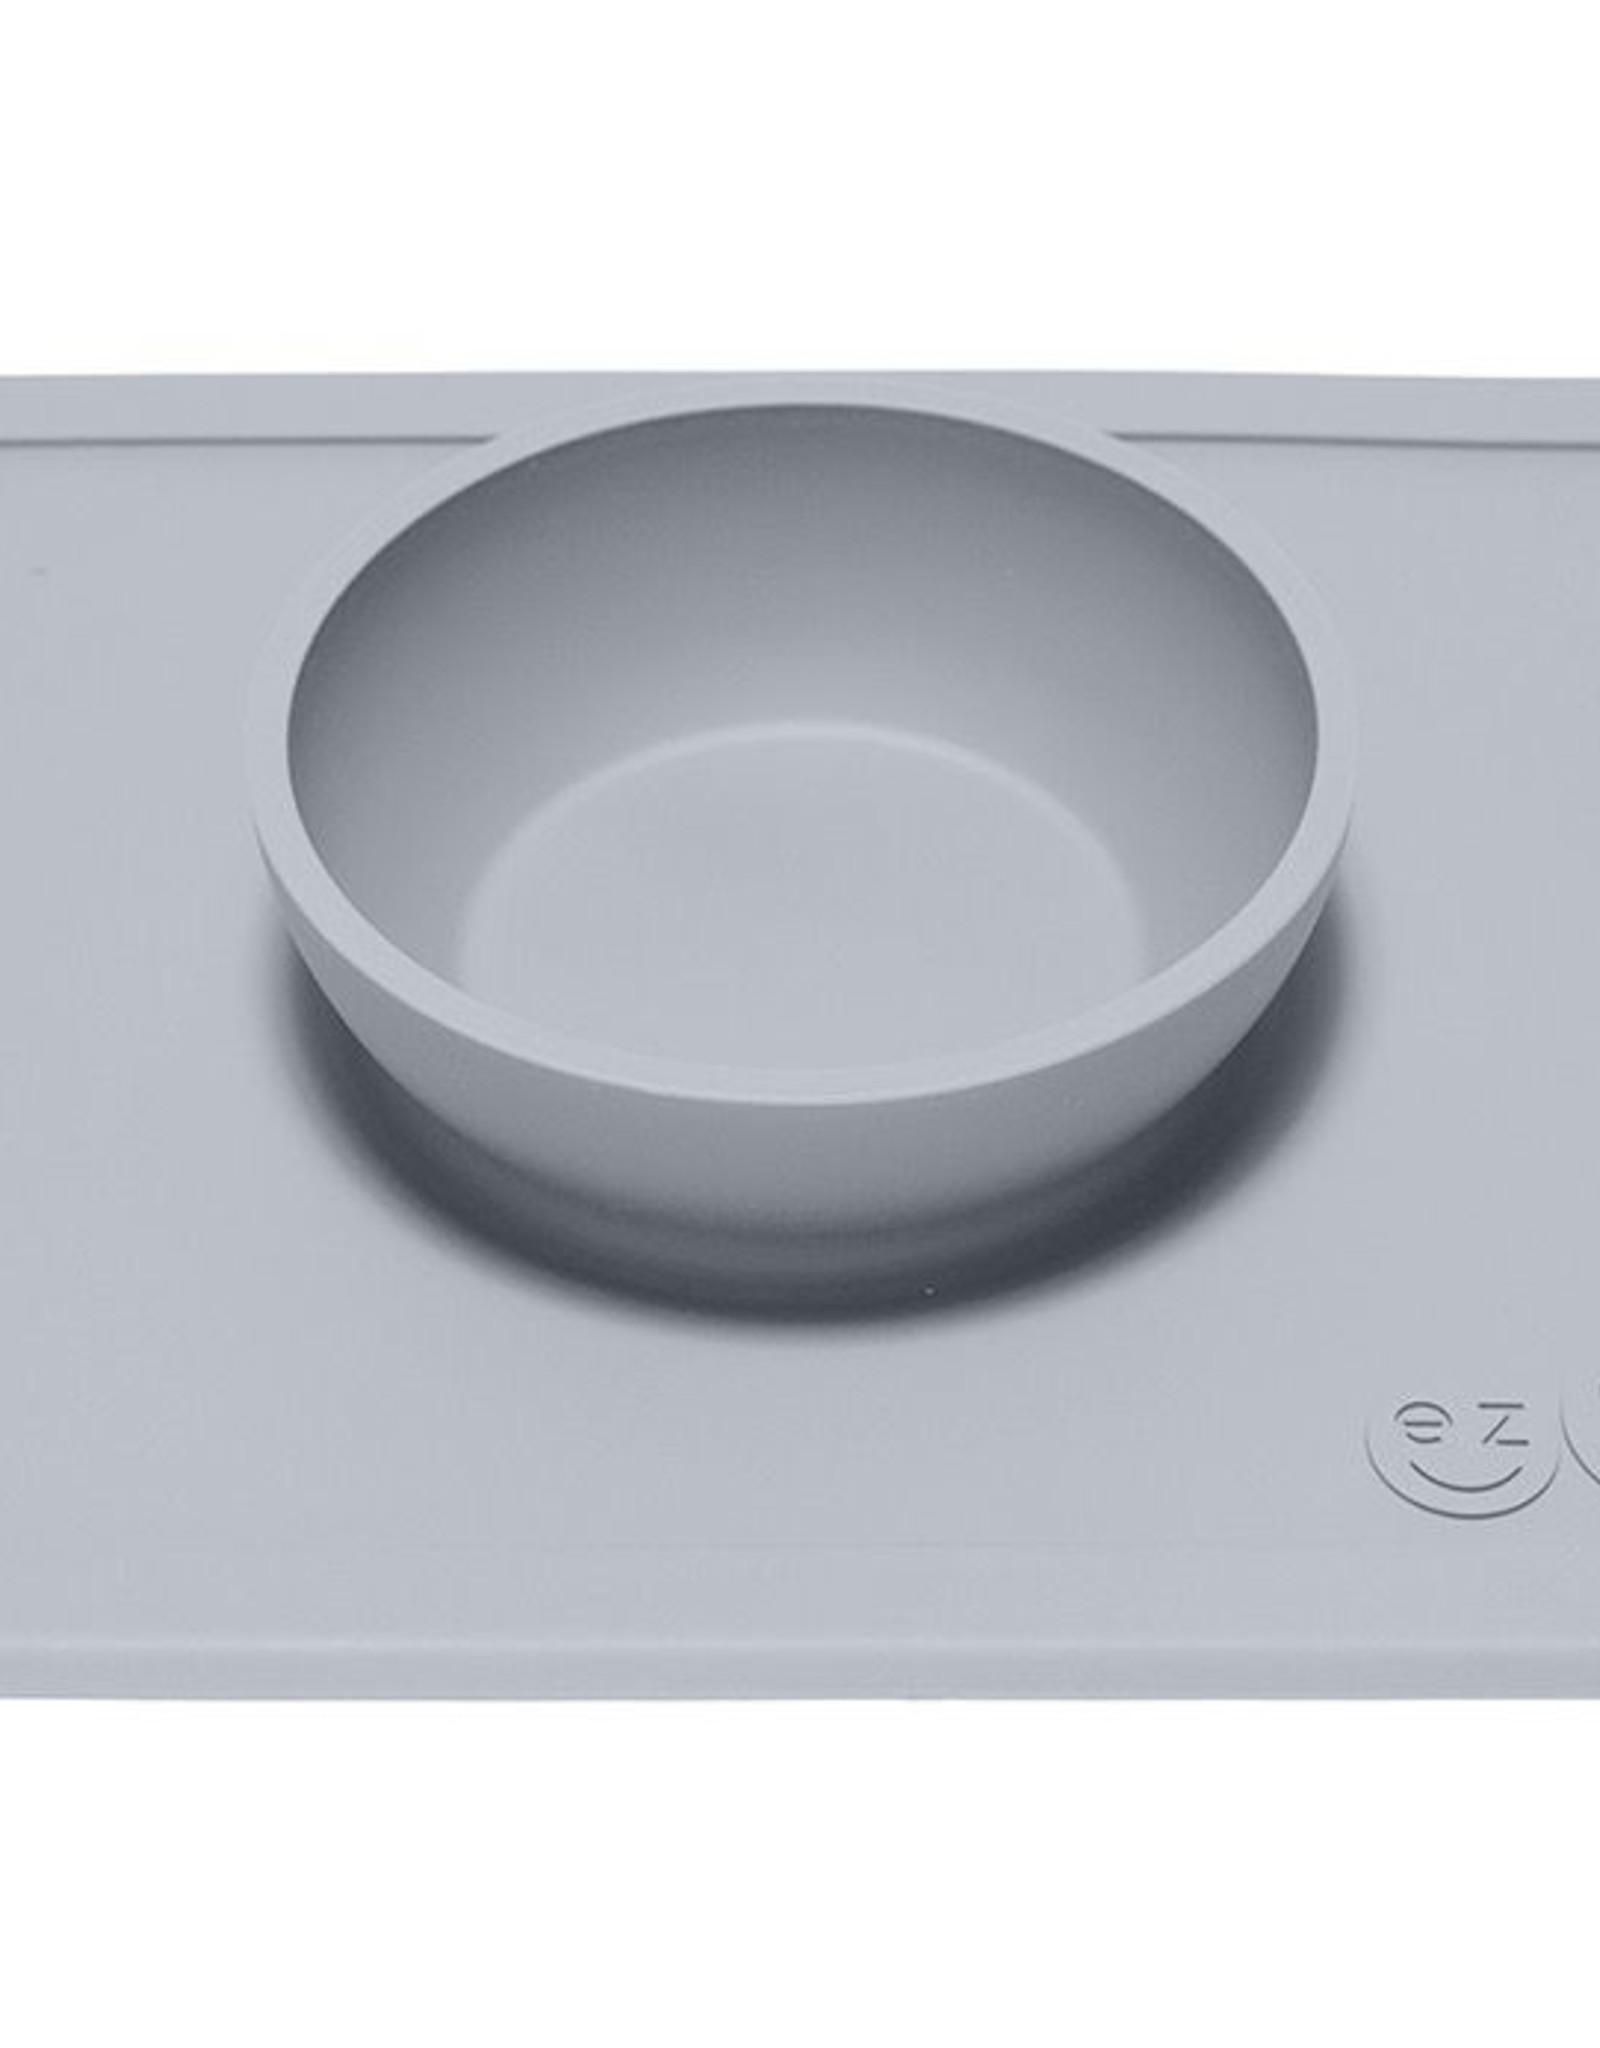 EZPZ Happy Bowl, Silicone Suction Placemat + Bowl